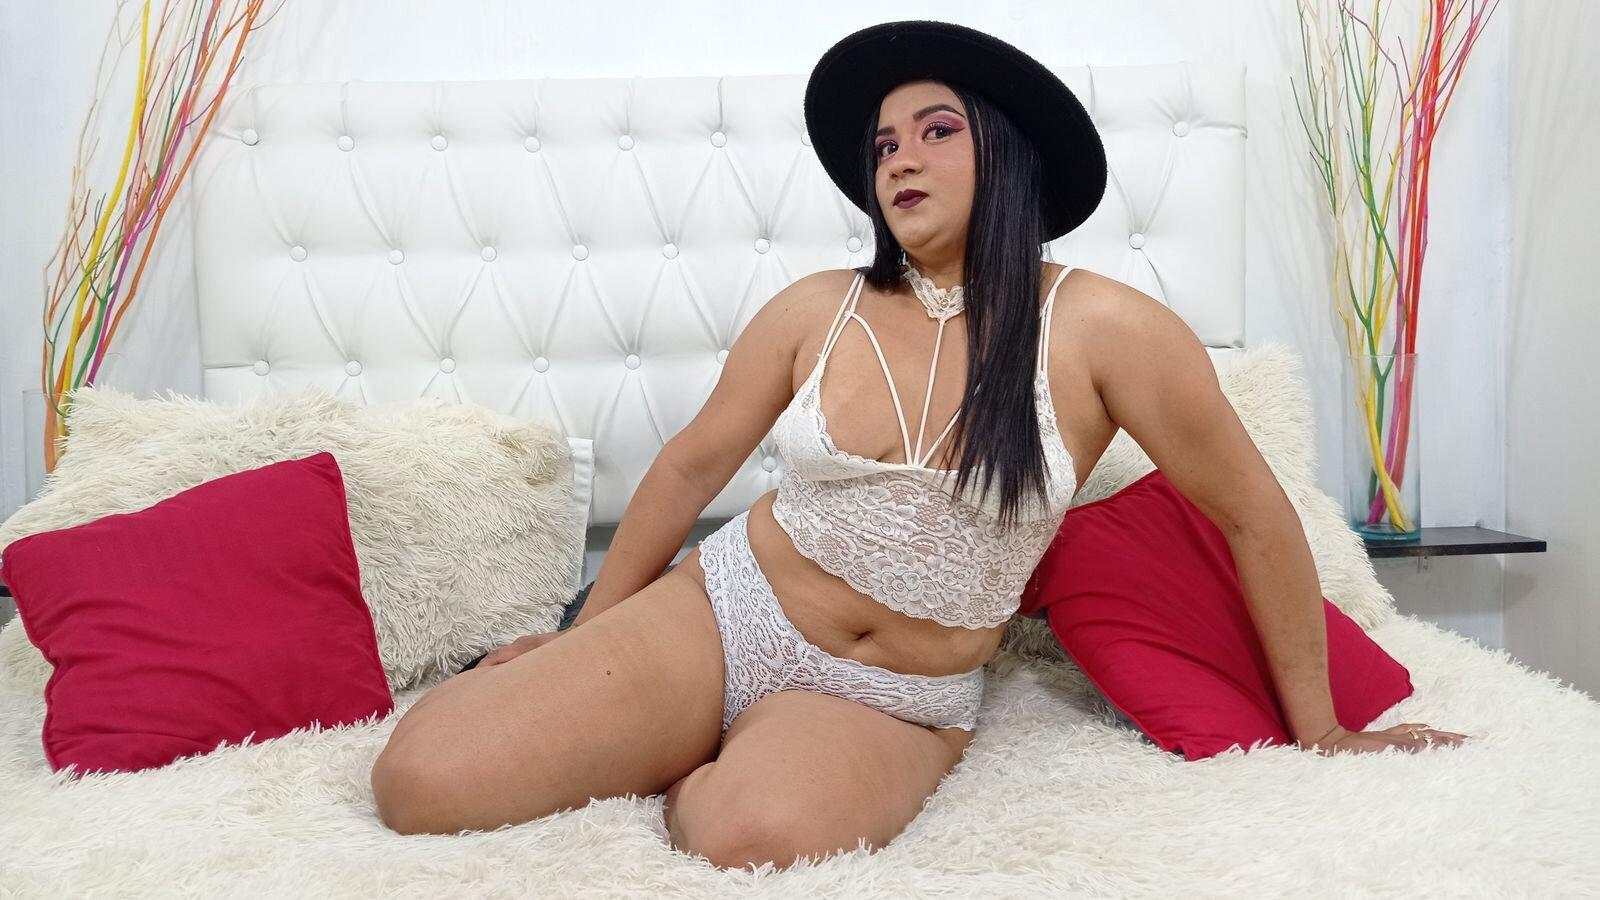 Swimsuit Male Nude Site Straight Web Scenes